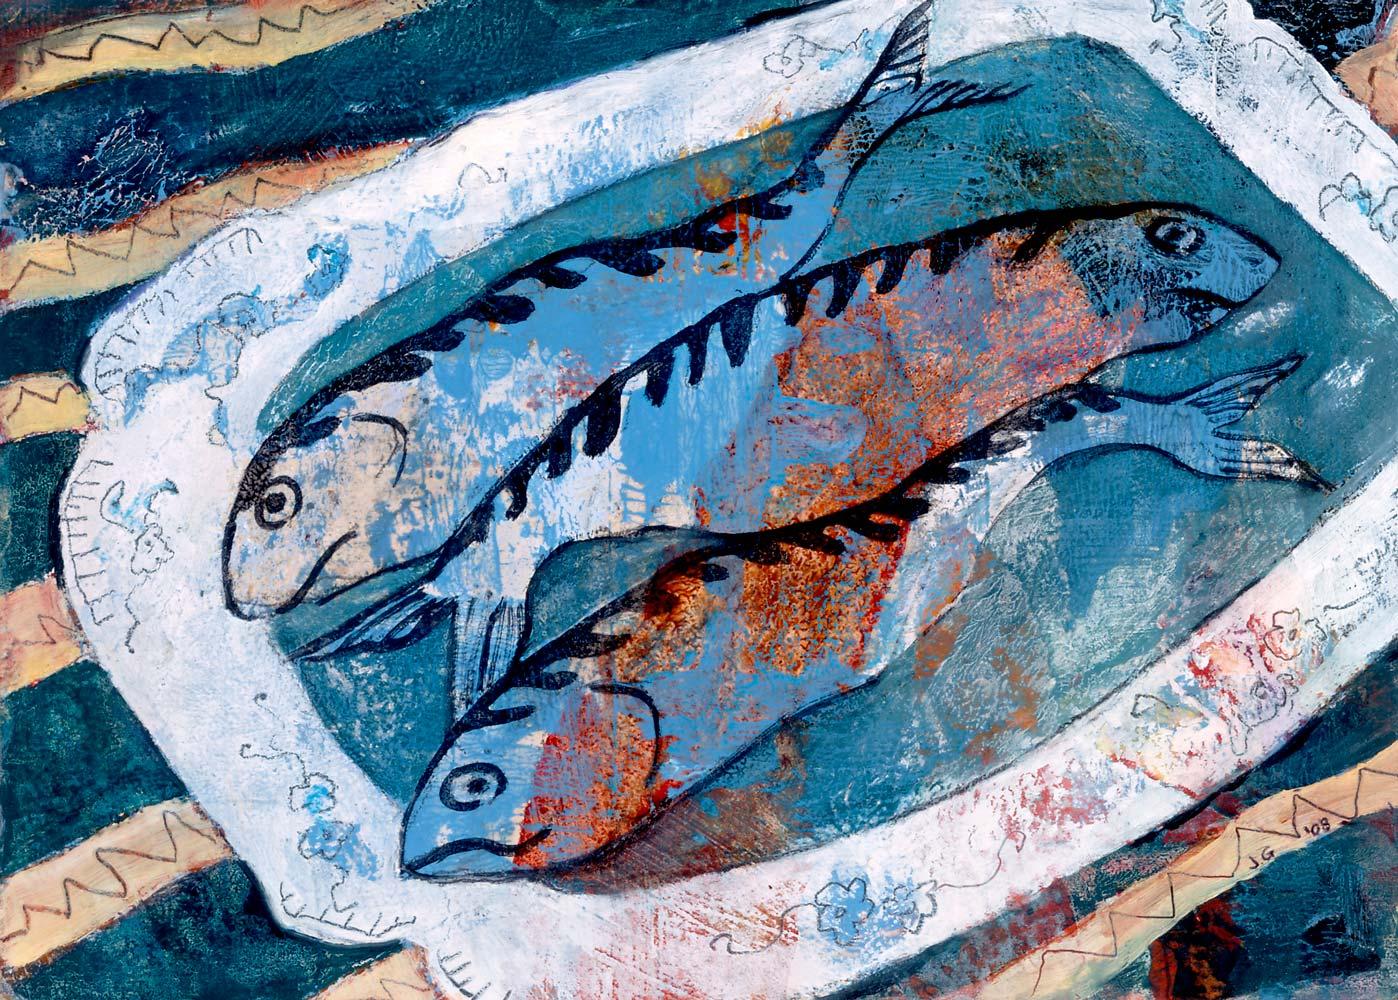 Small fish study